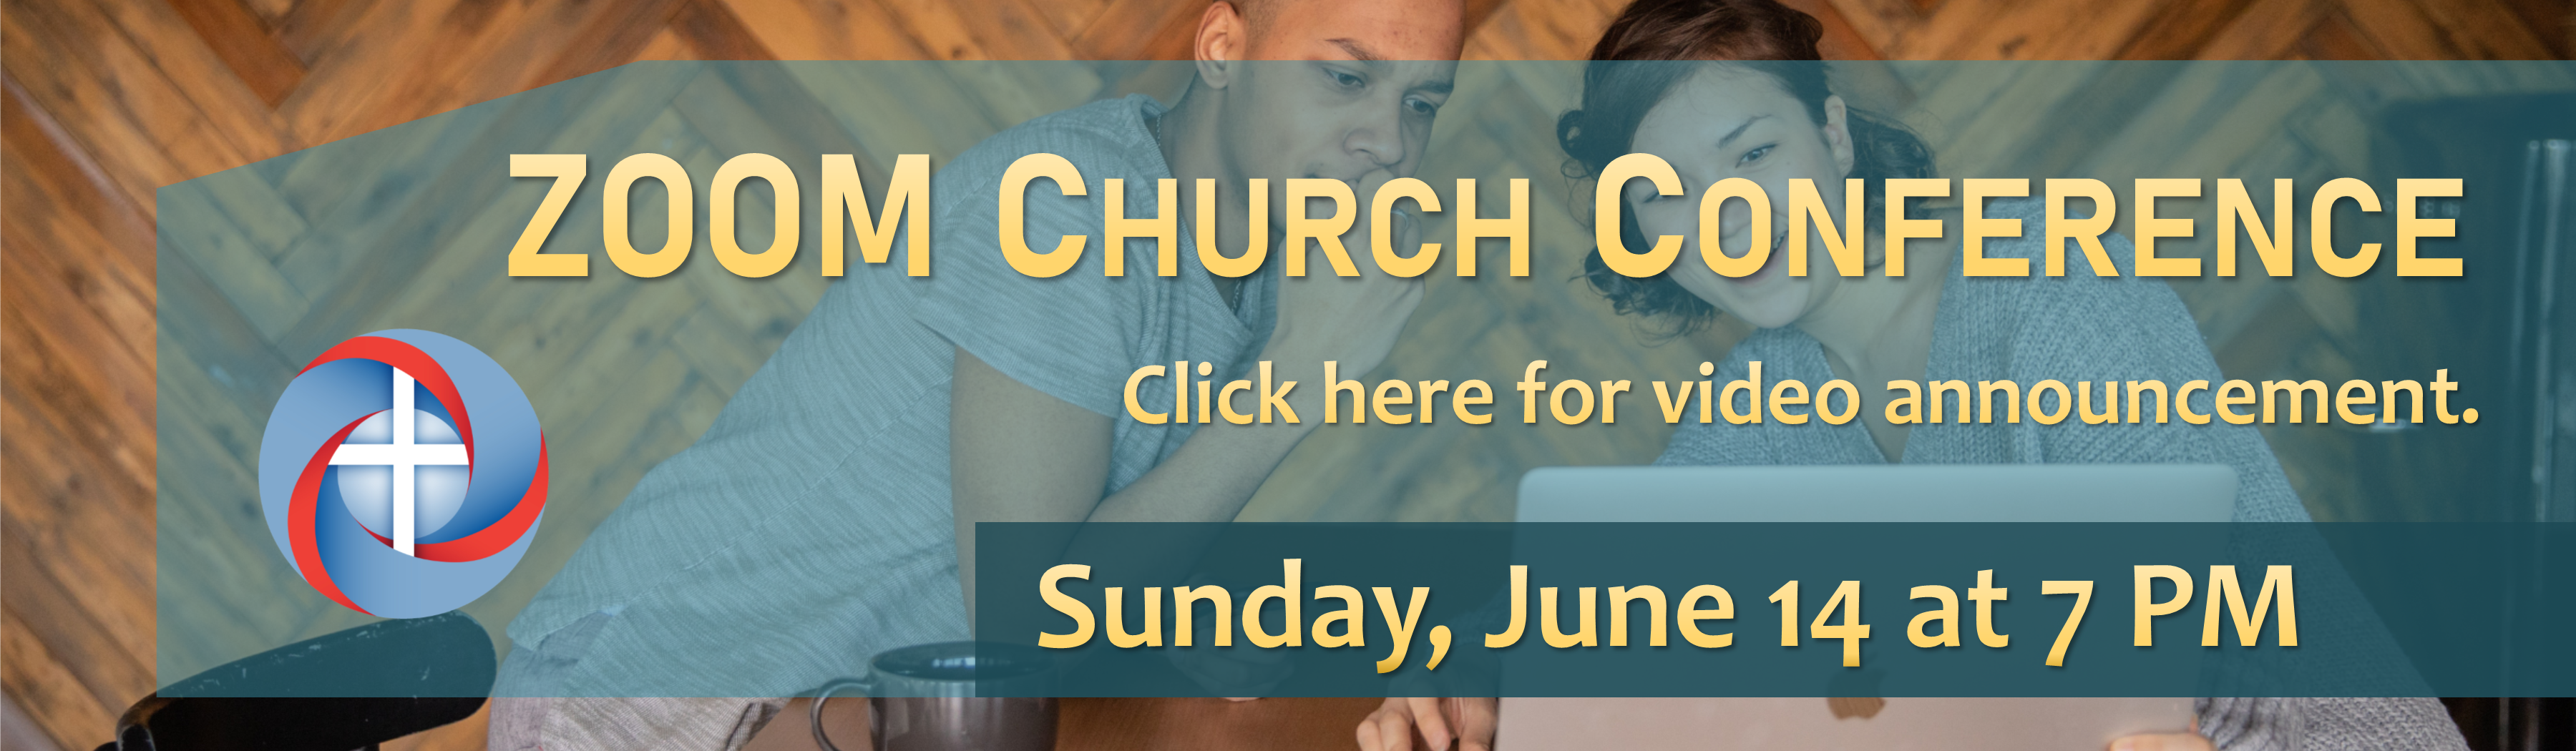 ChurchConfBanner